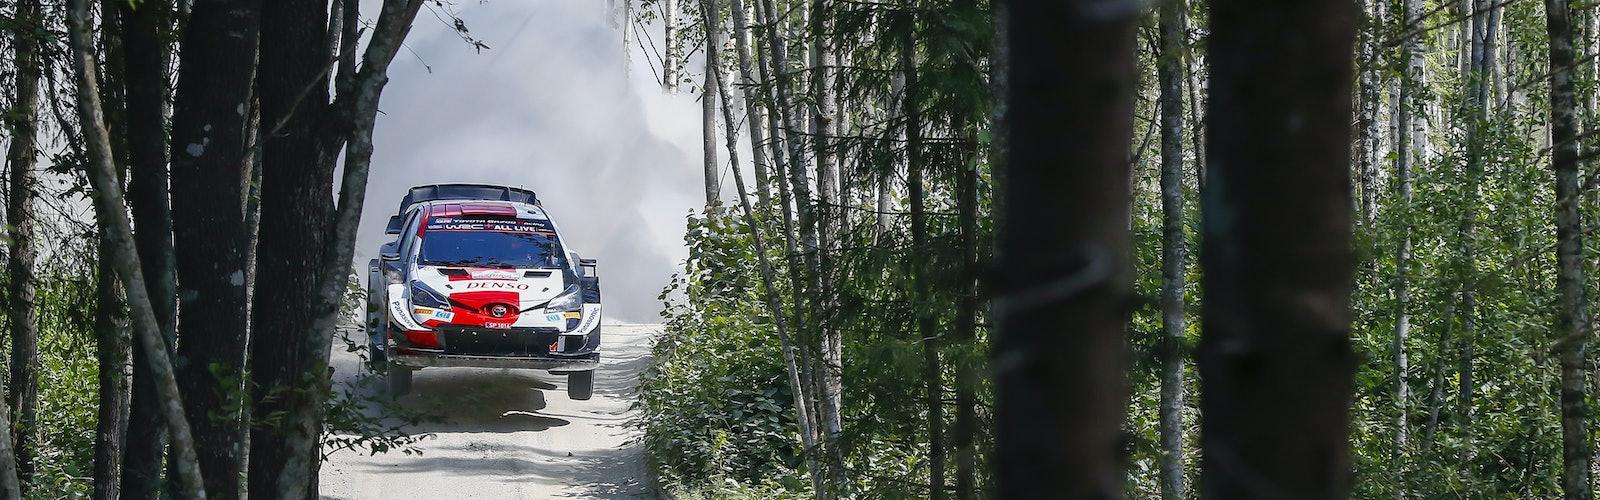 WRC_2021_Rd.7_268